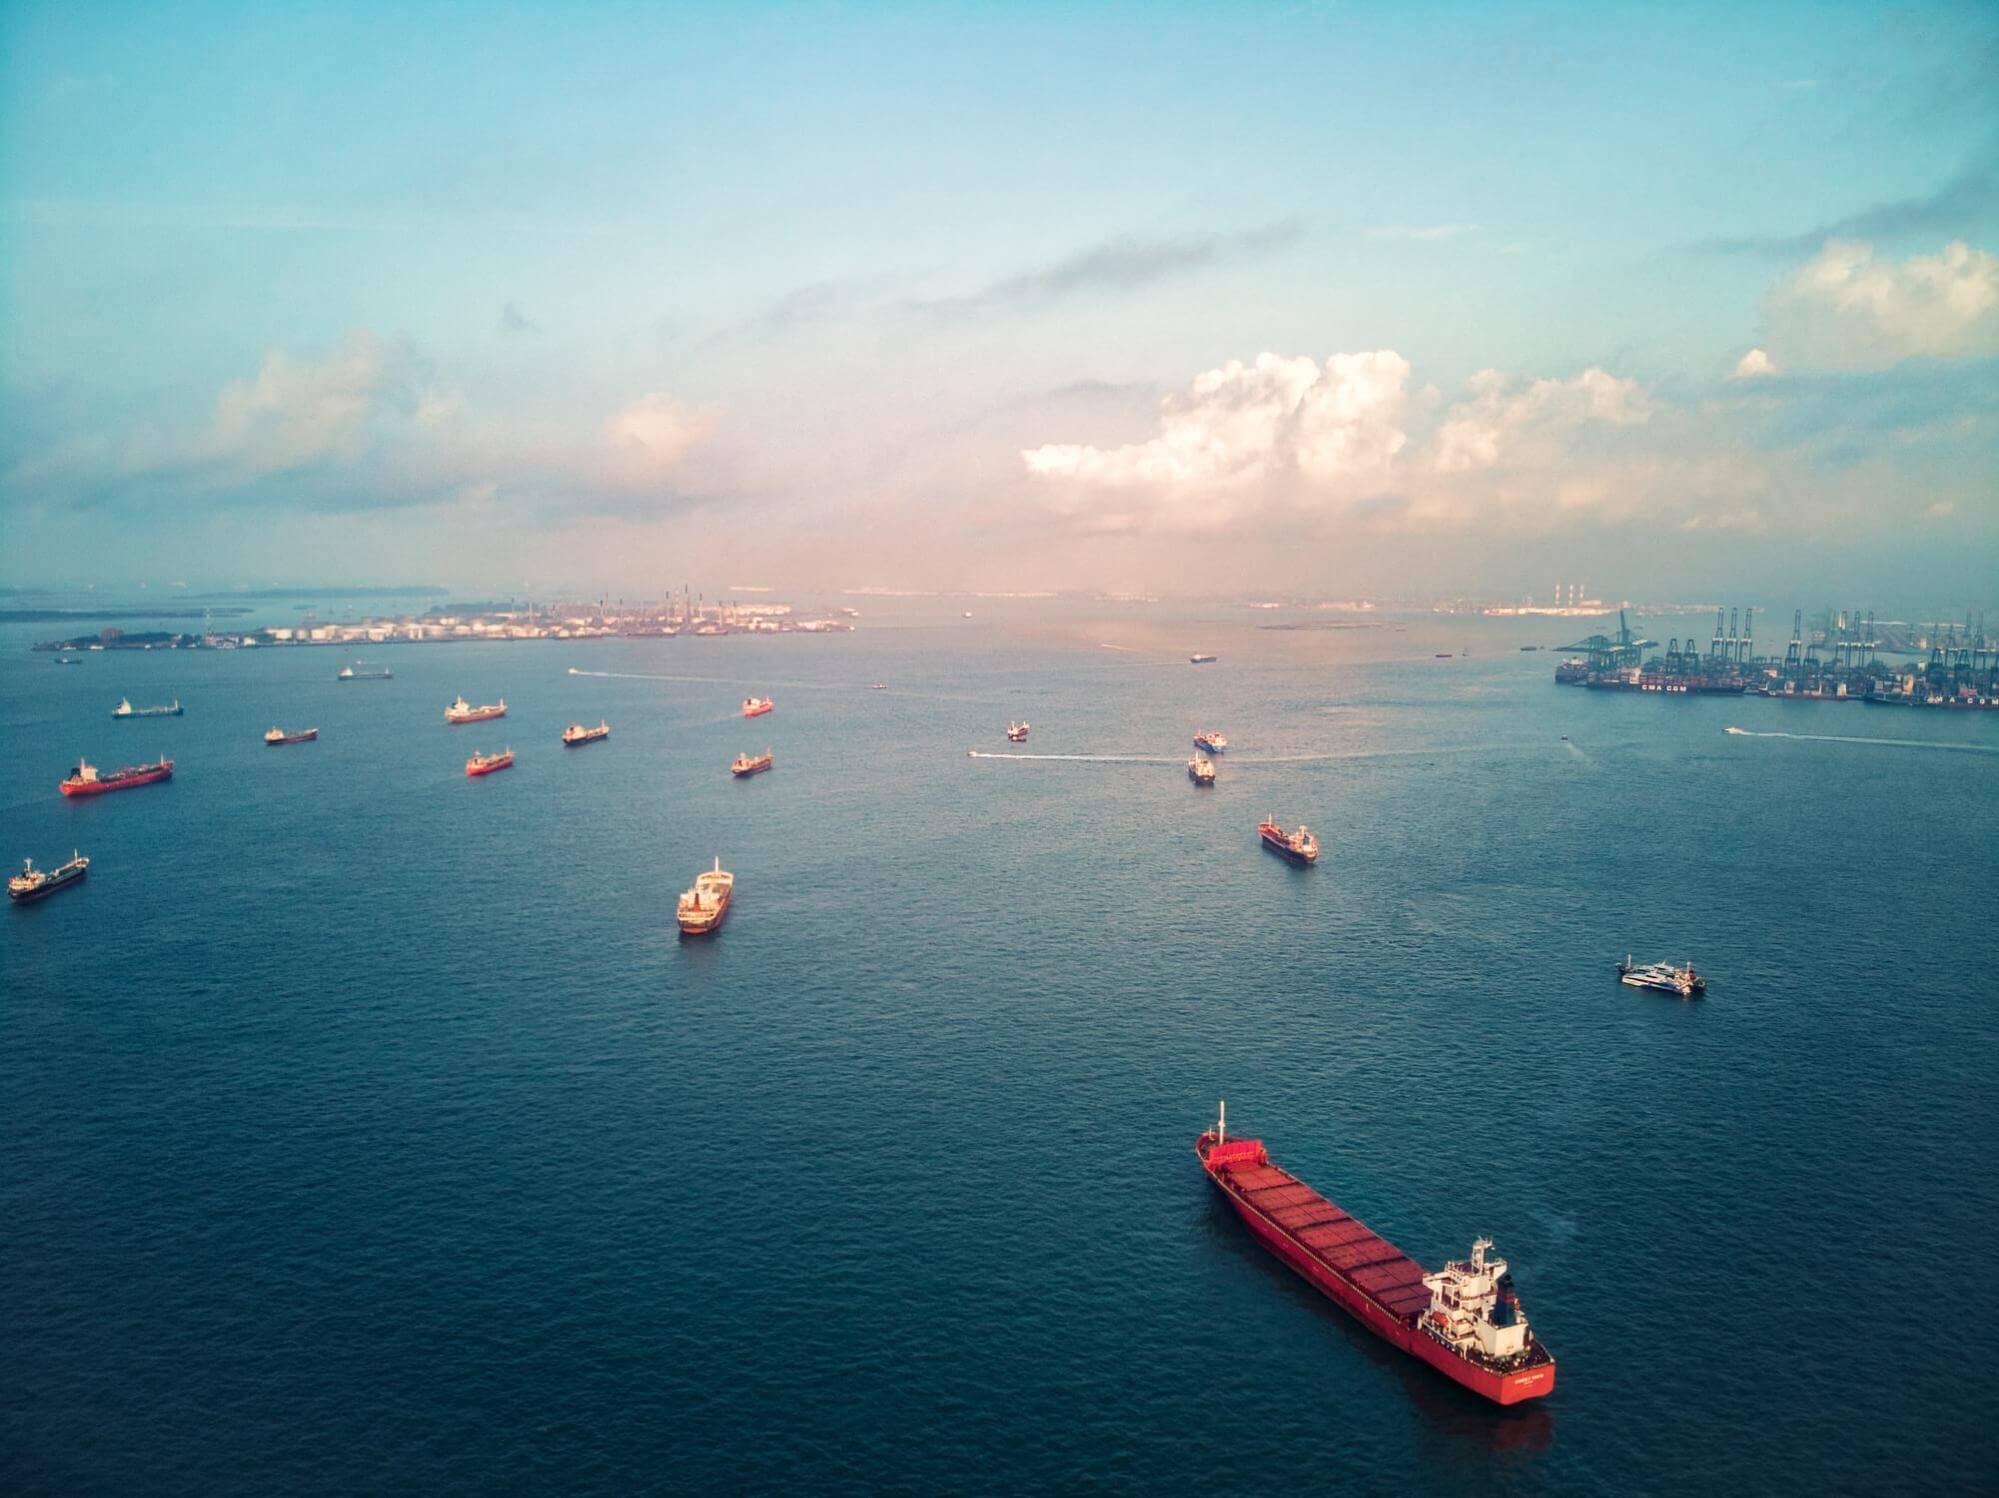 transporte de carga marítimo